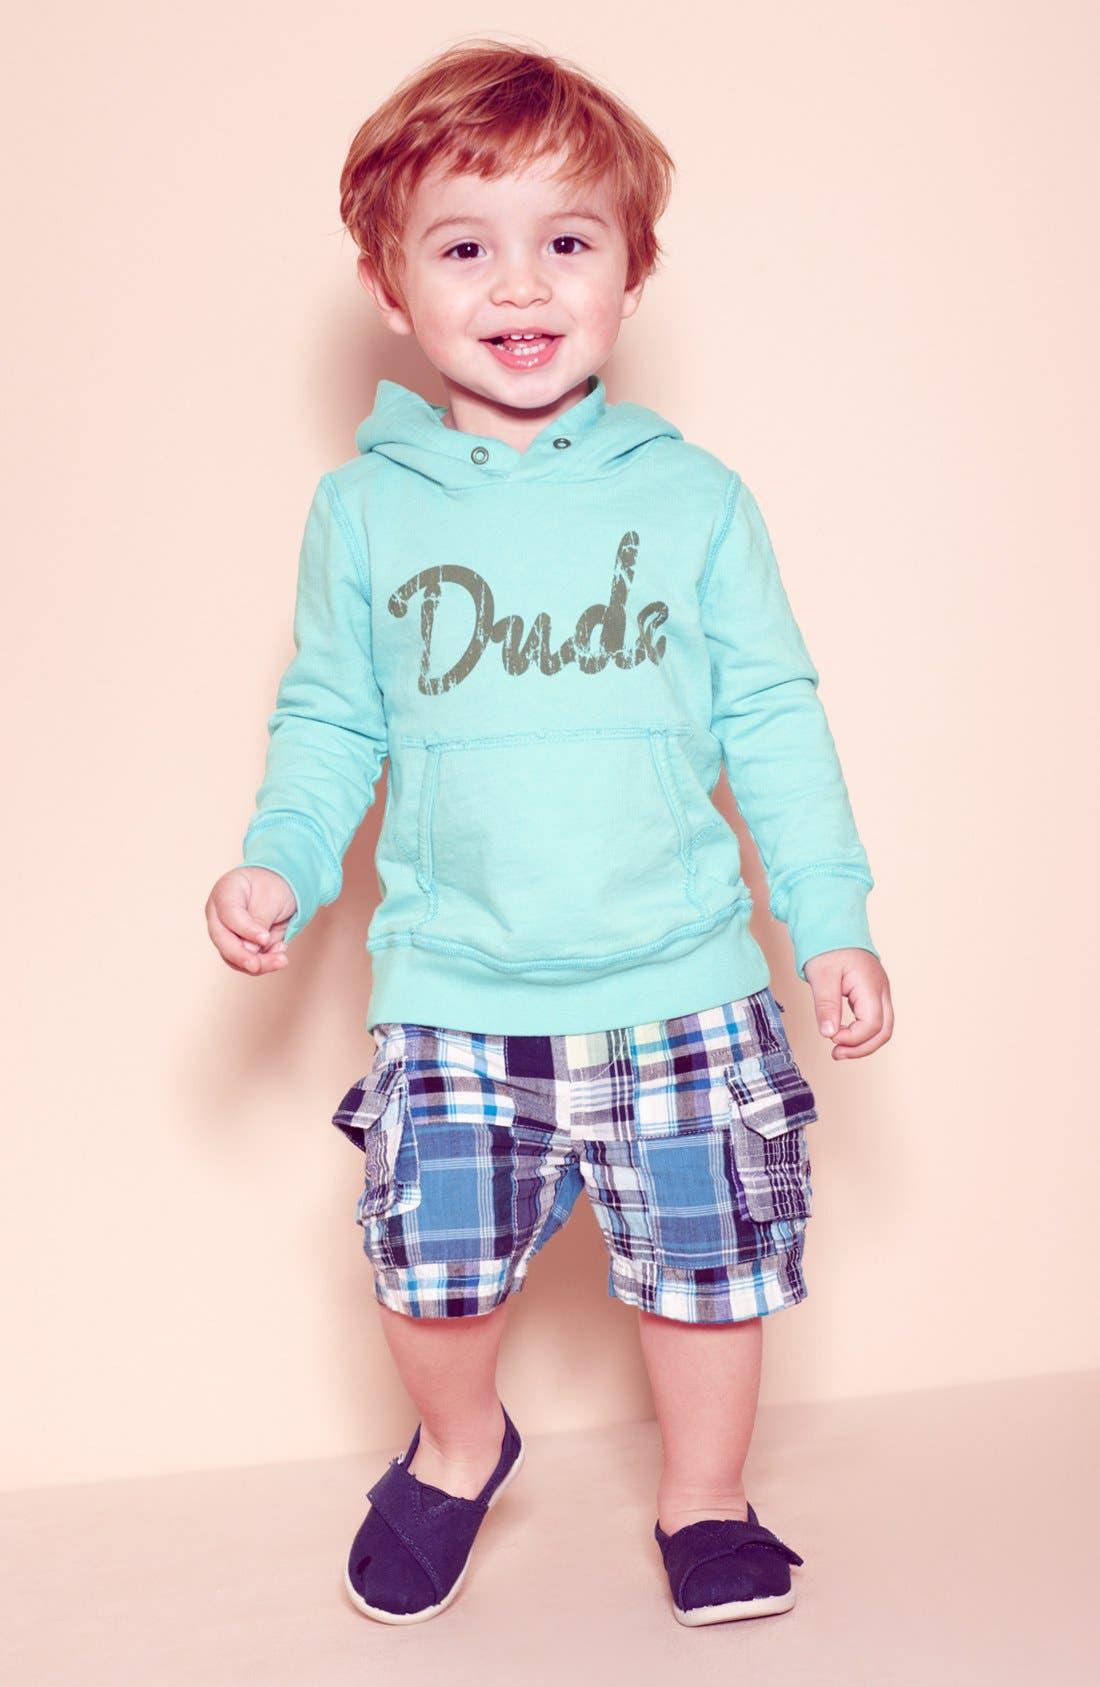 Alternate Image 1 Selected - Peek Hoodie & Plaid Shorts, Babiators Sunglasses & TOMS Slip-On (Infant)